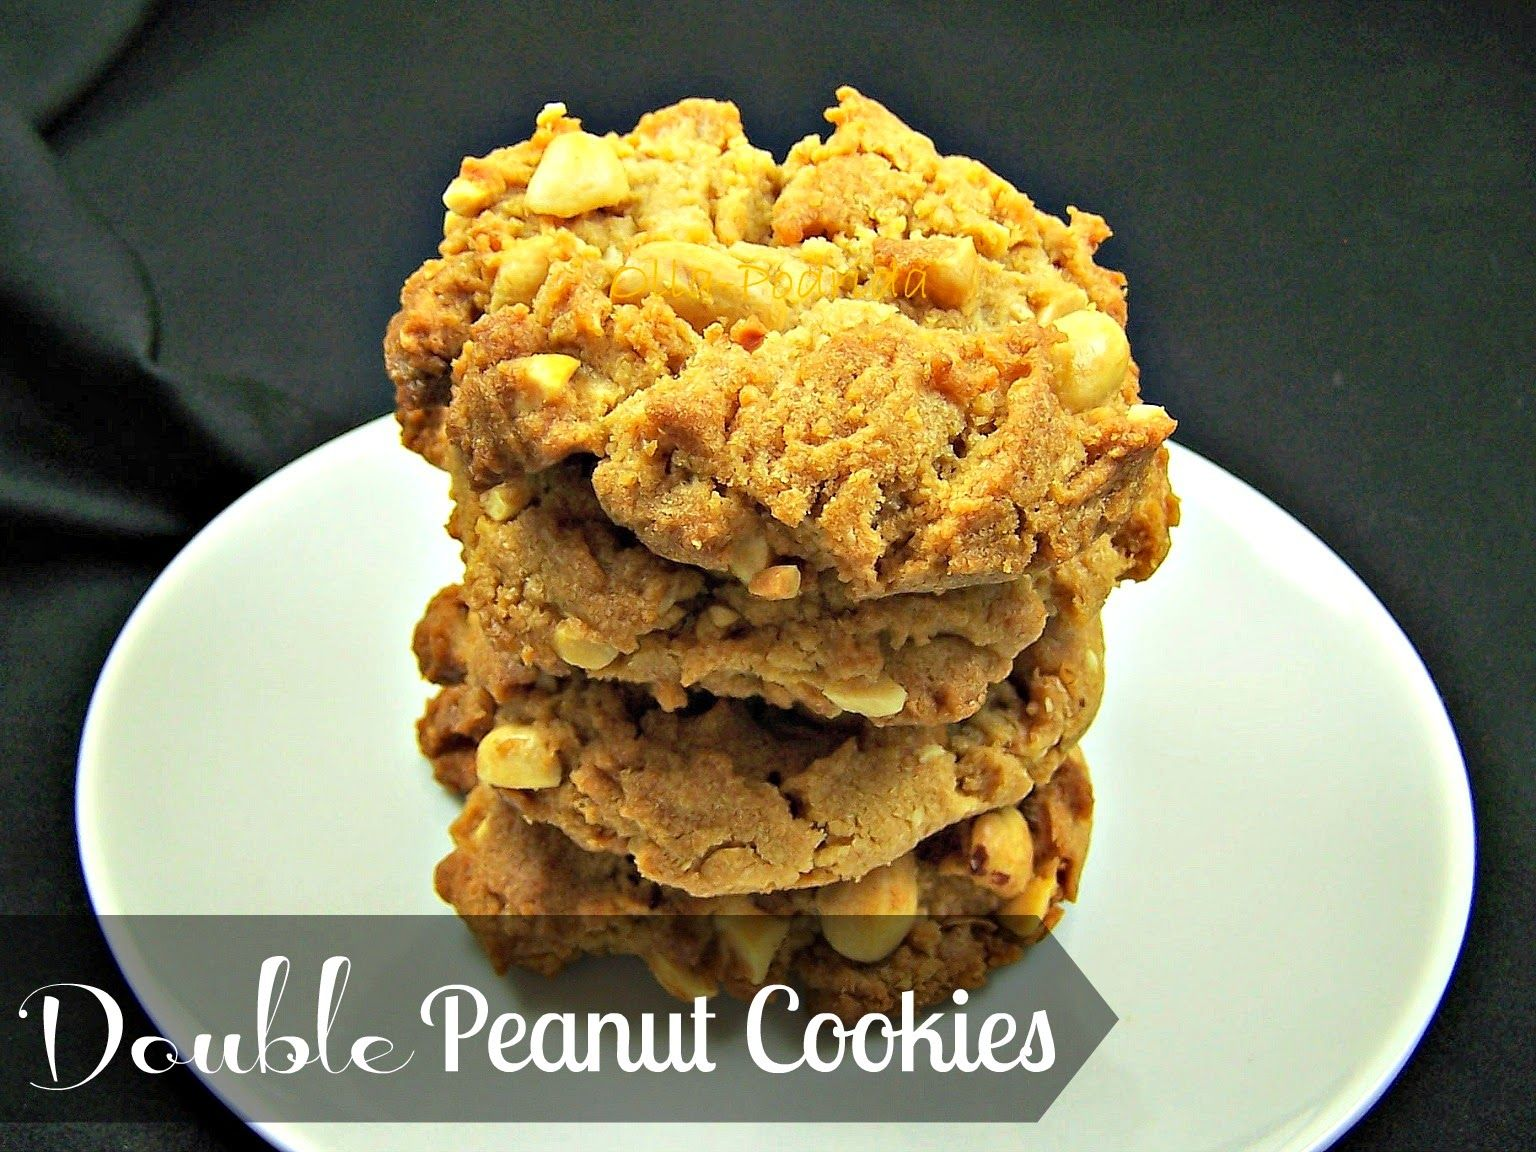 Double Peanut Cookies